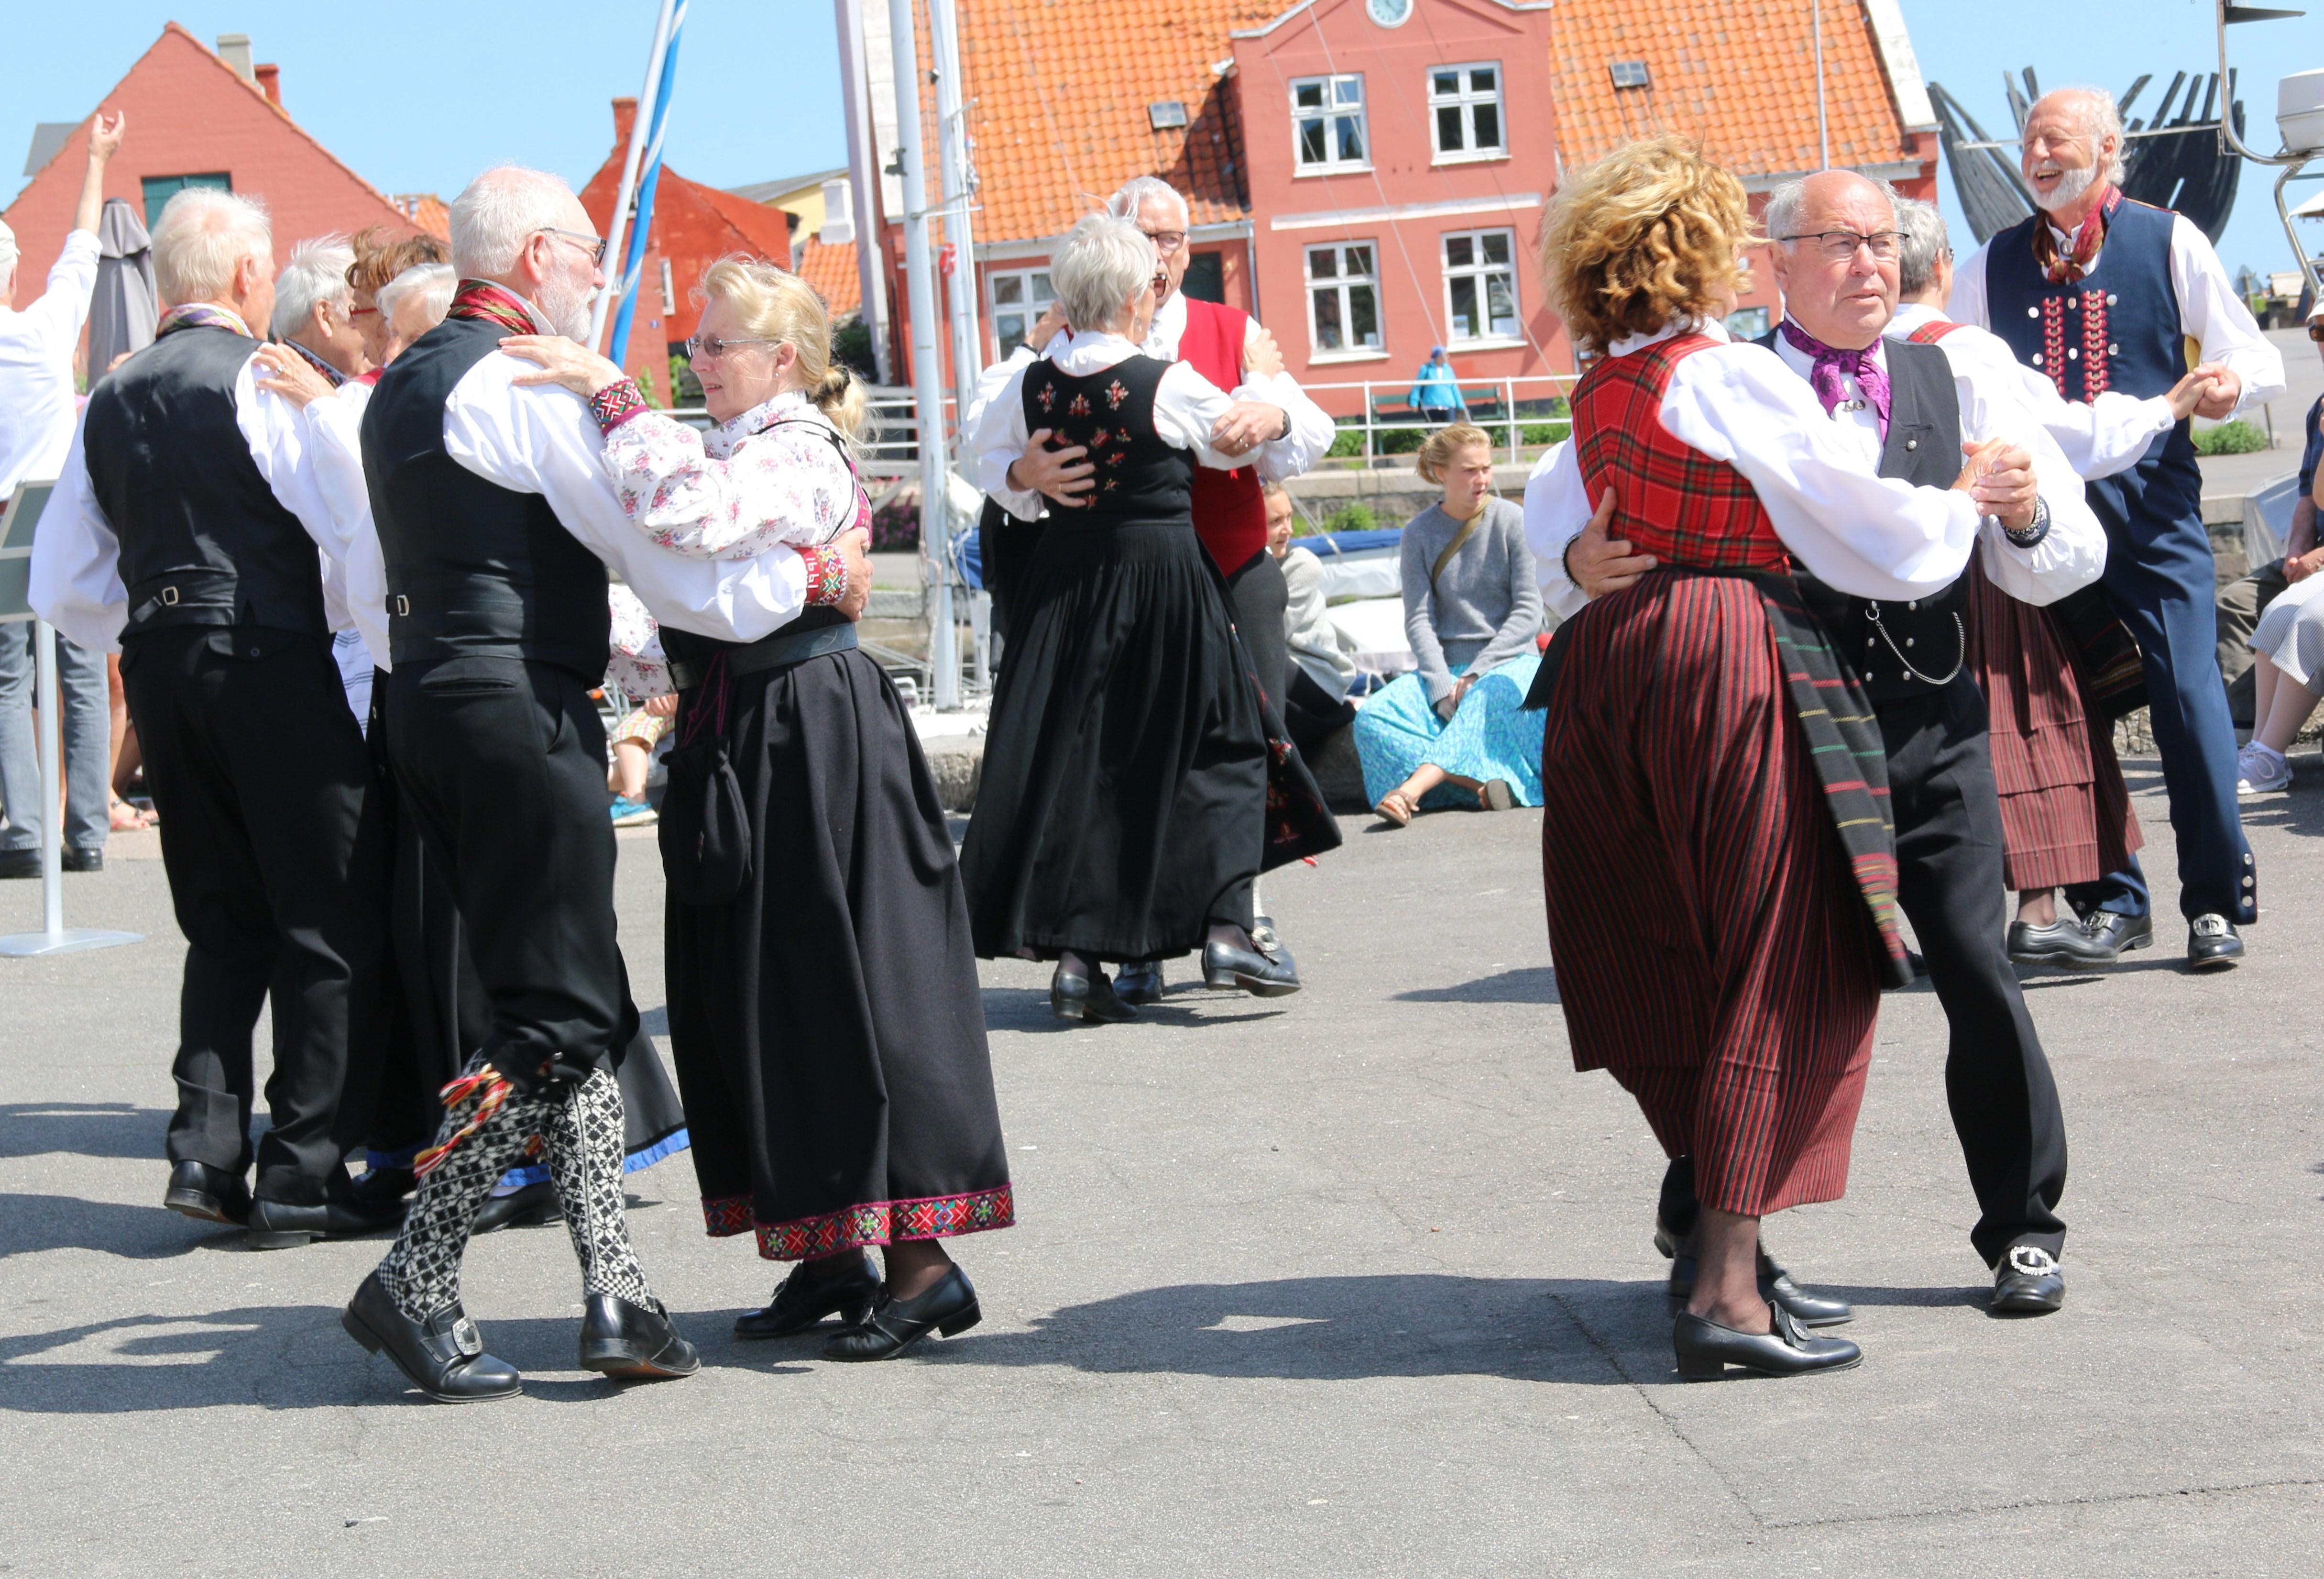 IMG_9432_Leikarringen_Noreg_Bornholm_2019_Svaneke_Noreg_Fremsyning.JPG